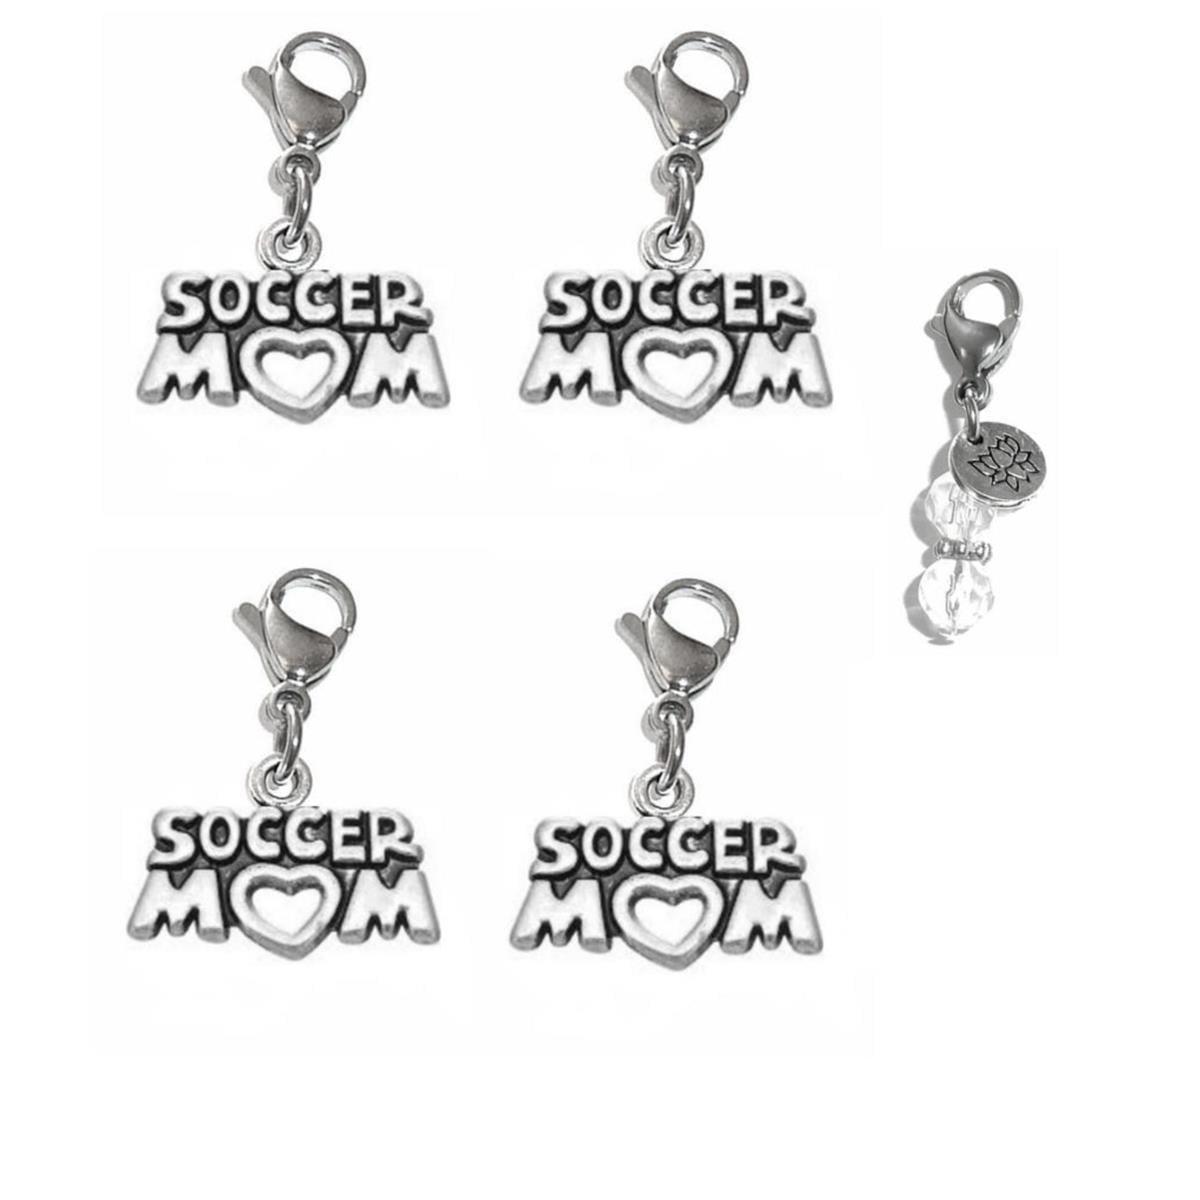 Clip-on-Charm special mother Bracelet Pendant Purse Zipper Pull